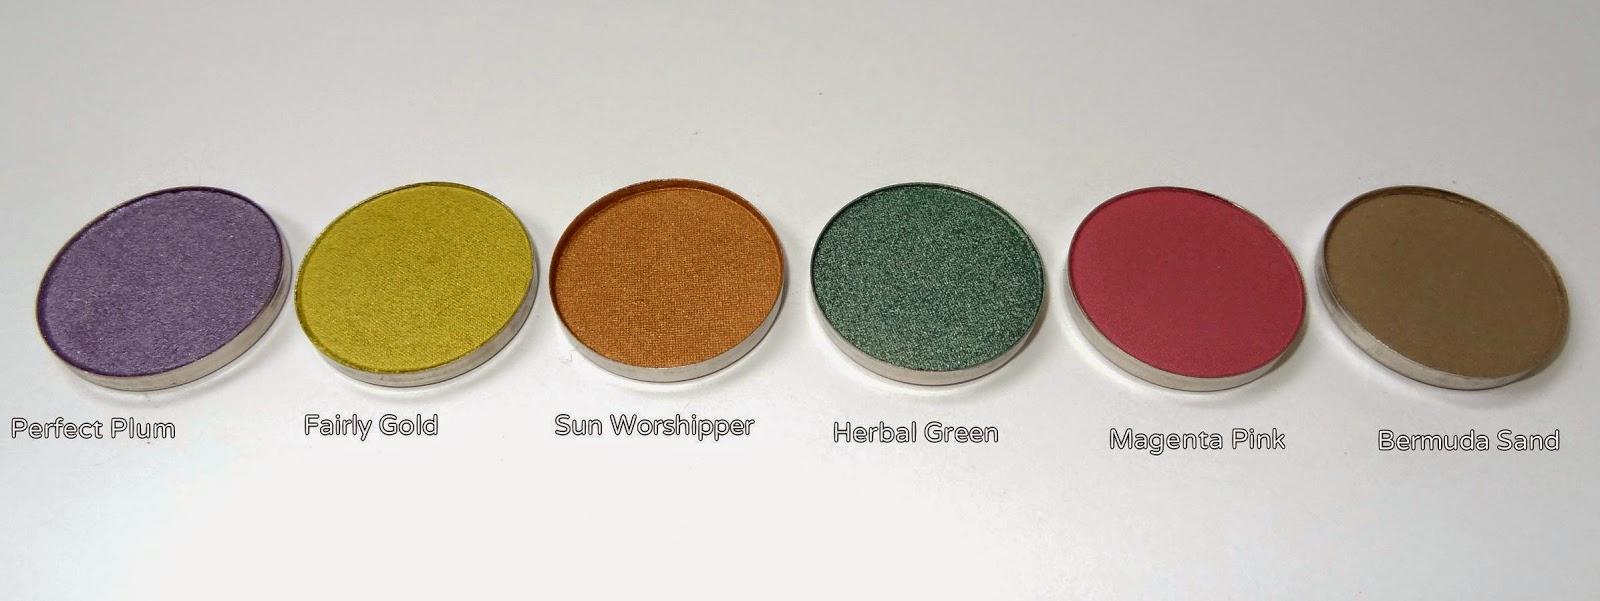 coastal scents hot pots haul perfect plum,fairy gold,sunworshipper,herbal green,magenta pink,bermuda sand